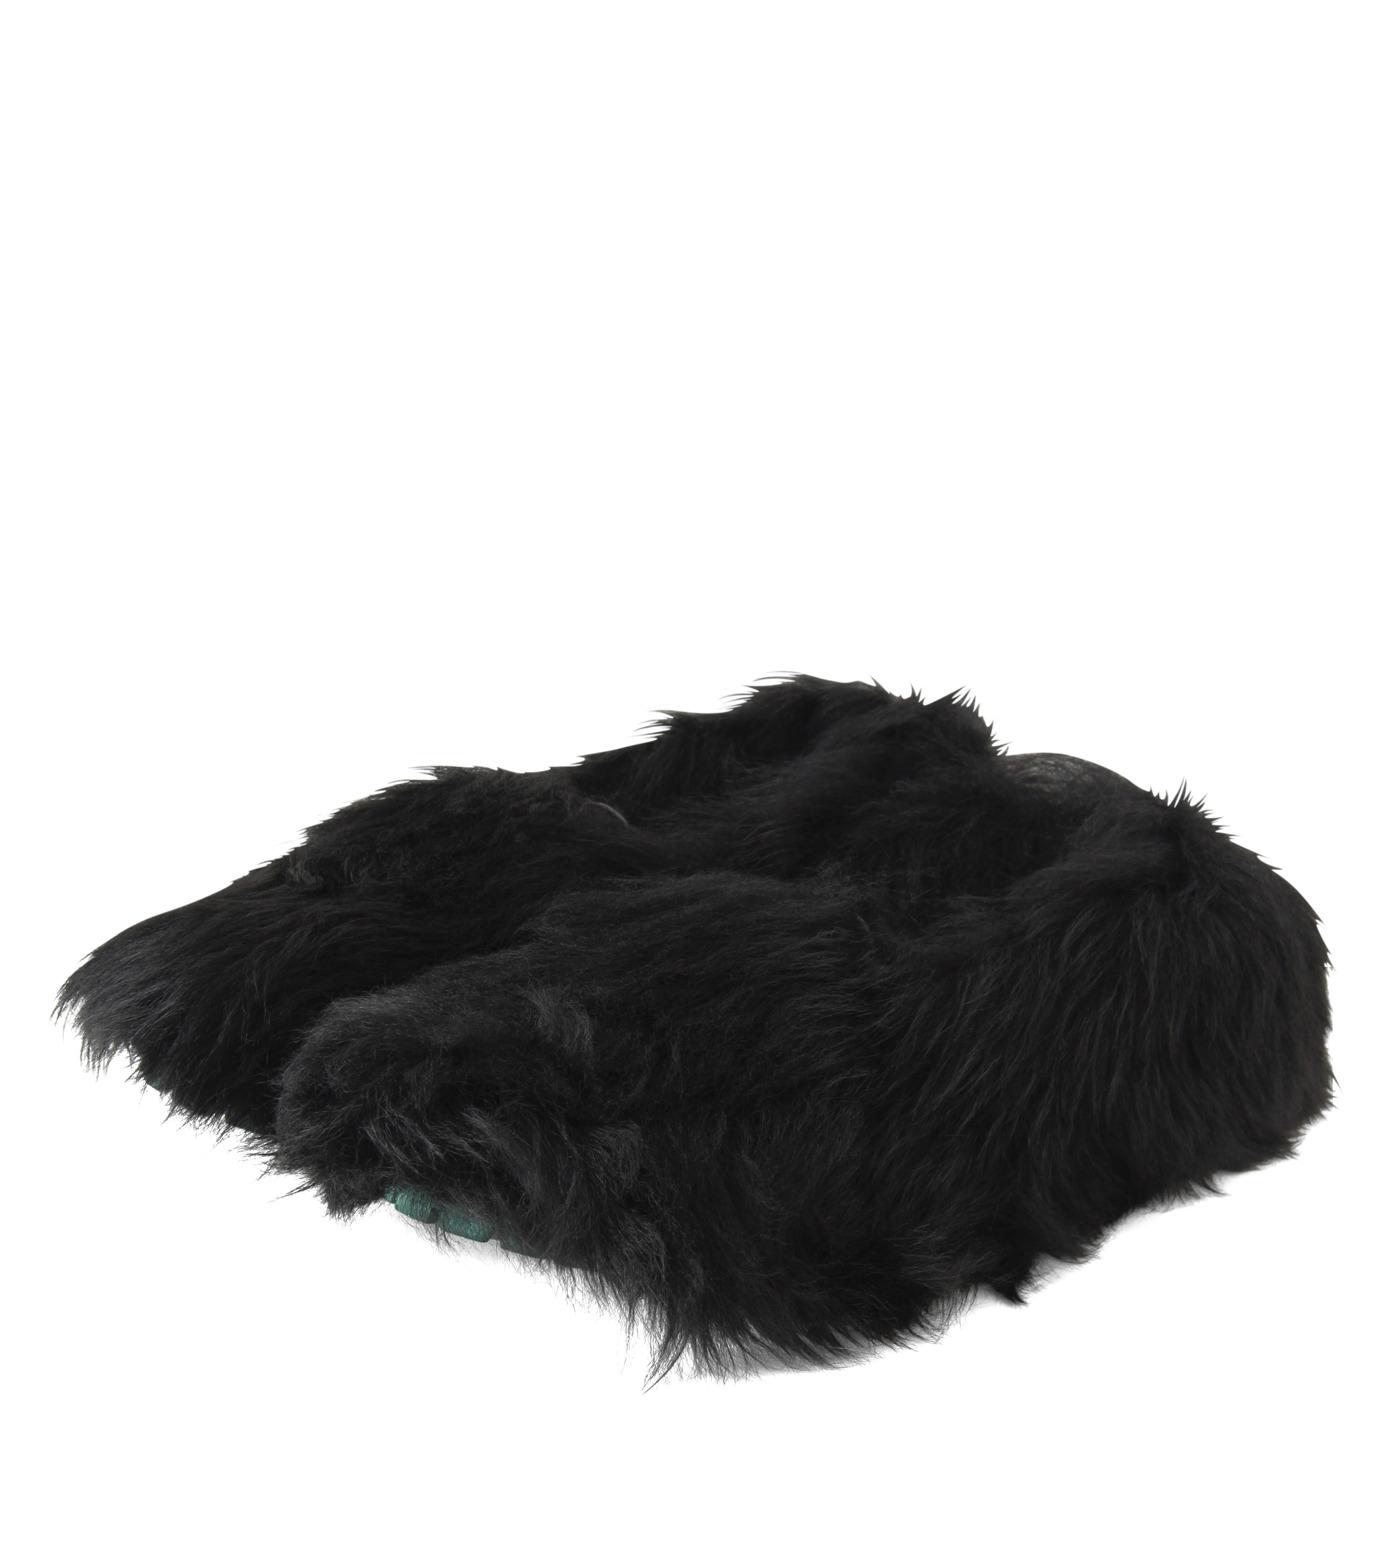 ACNE STUDIOS(アクネ ストゥディオズ)のBalto Fur Slipon-BLACK(シューズ/shoes)-2E0144-13 拡大詳細画像4